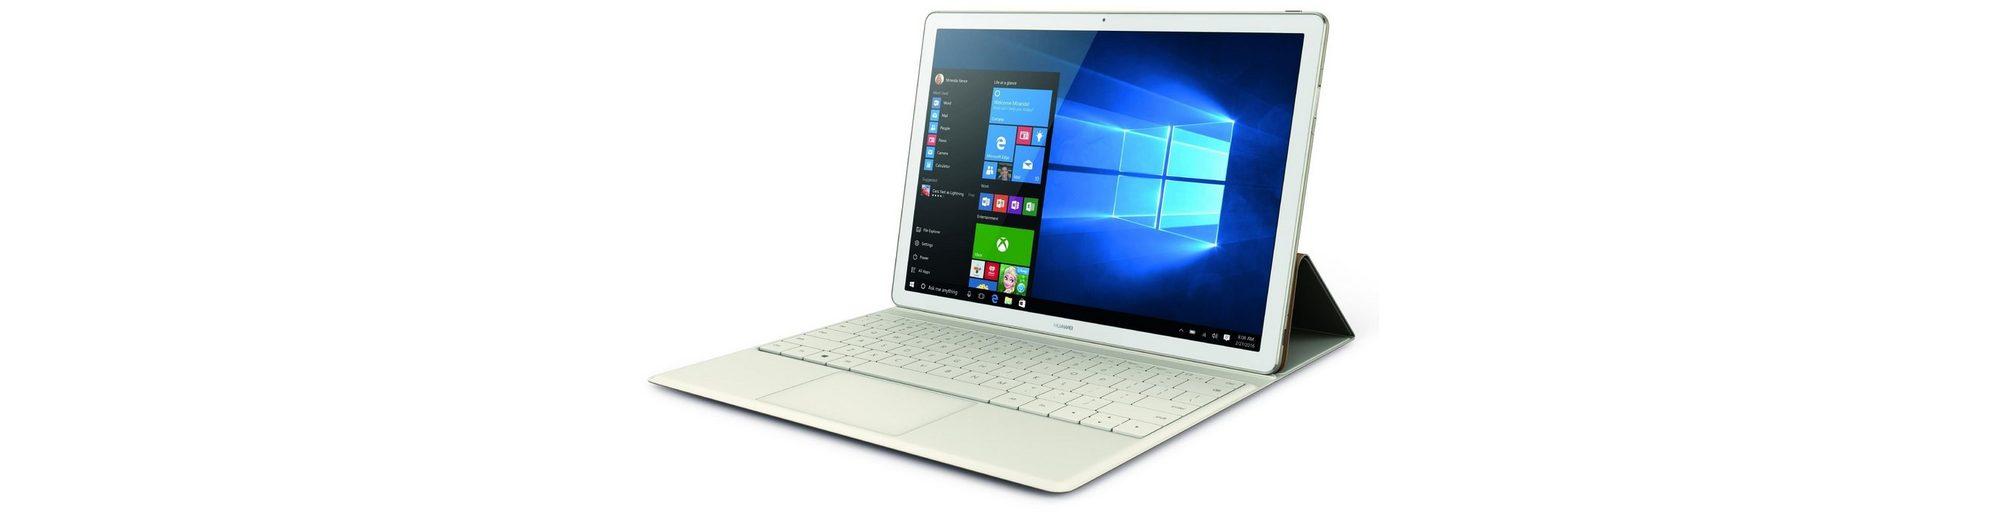 "HUAWEI Matebook Business M5 »Intel Core m5, 30,48cm (12""), 256 GB SSD, 8 GB«"